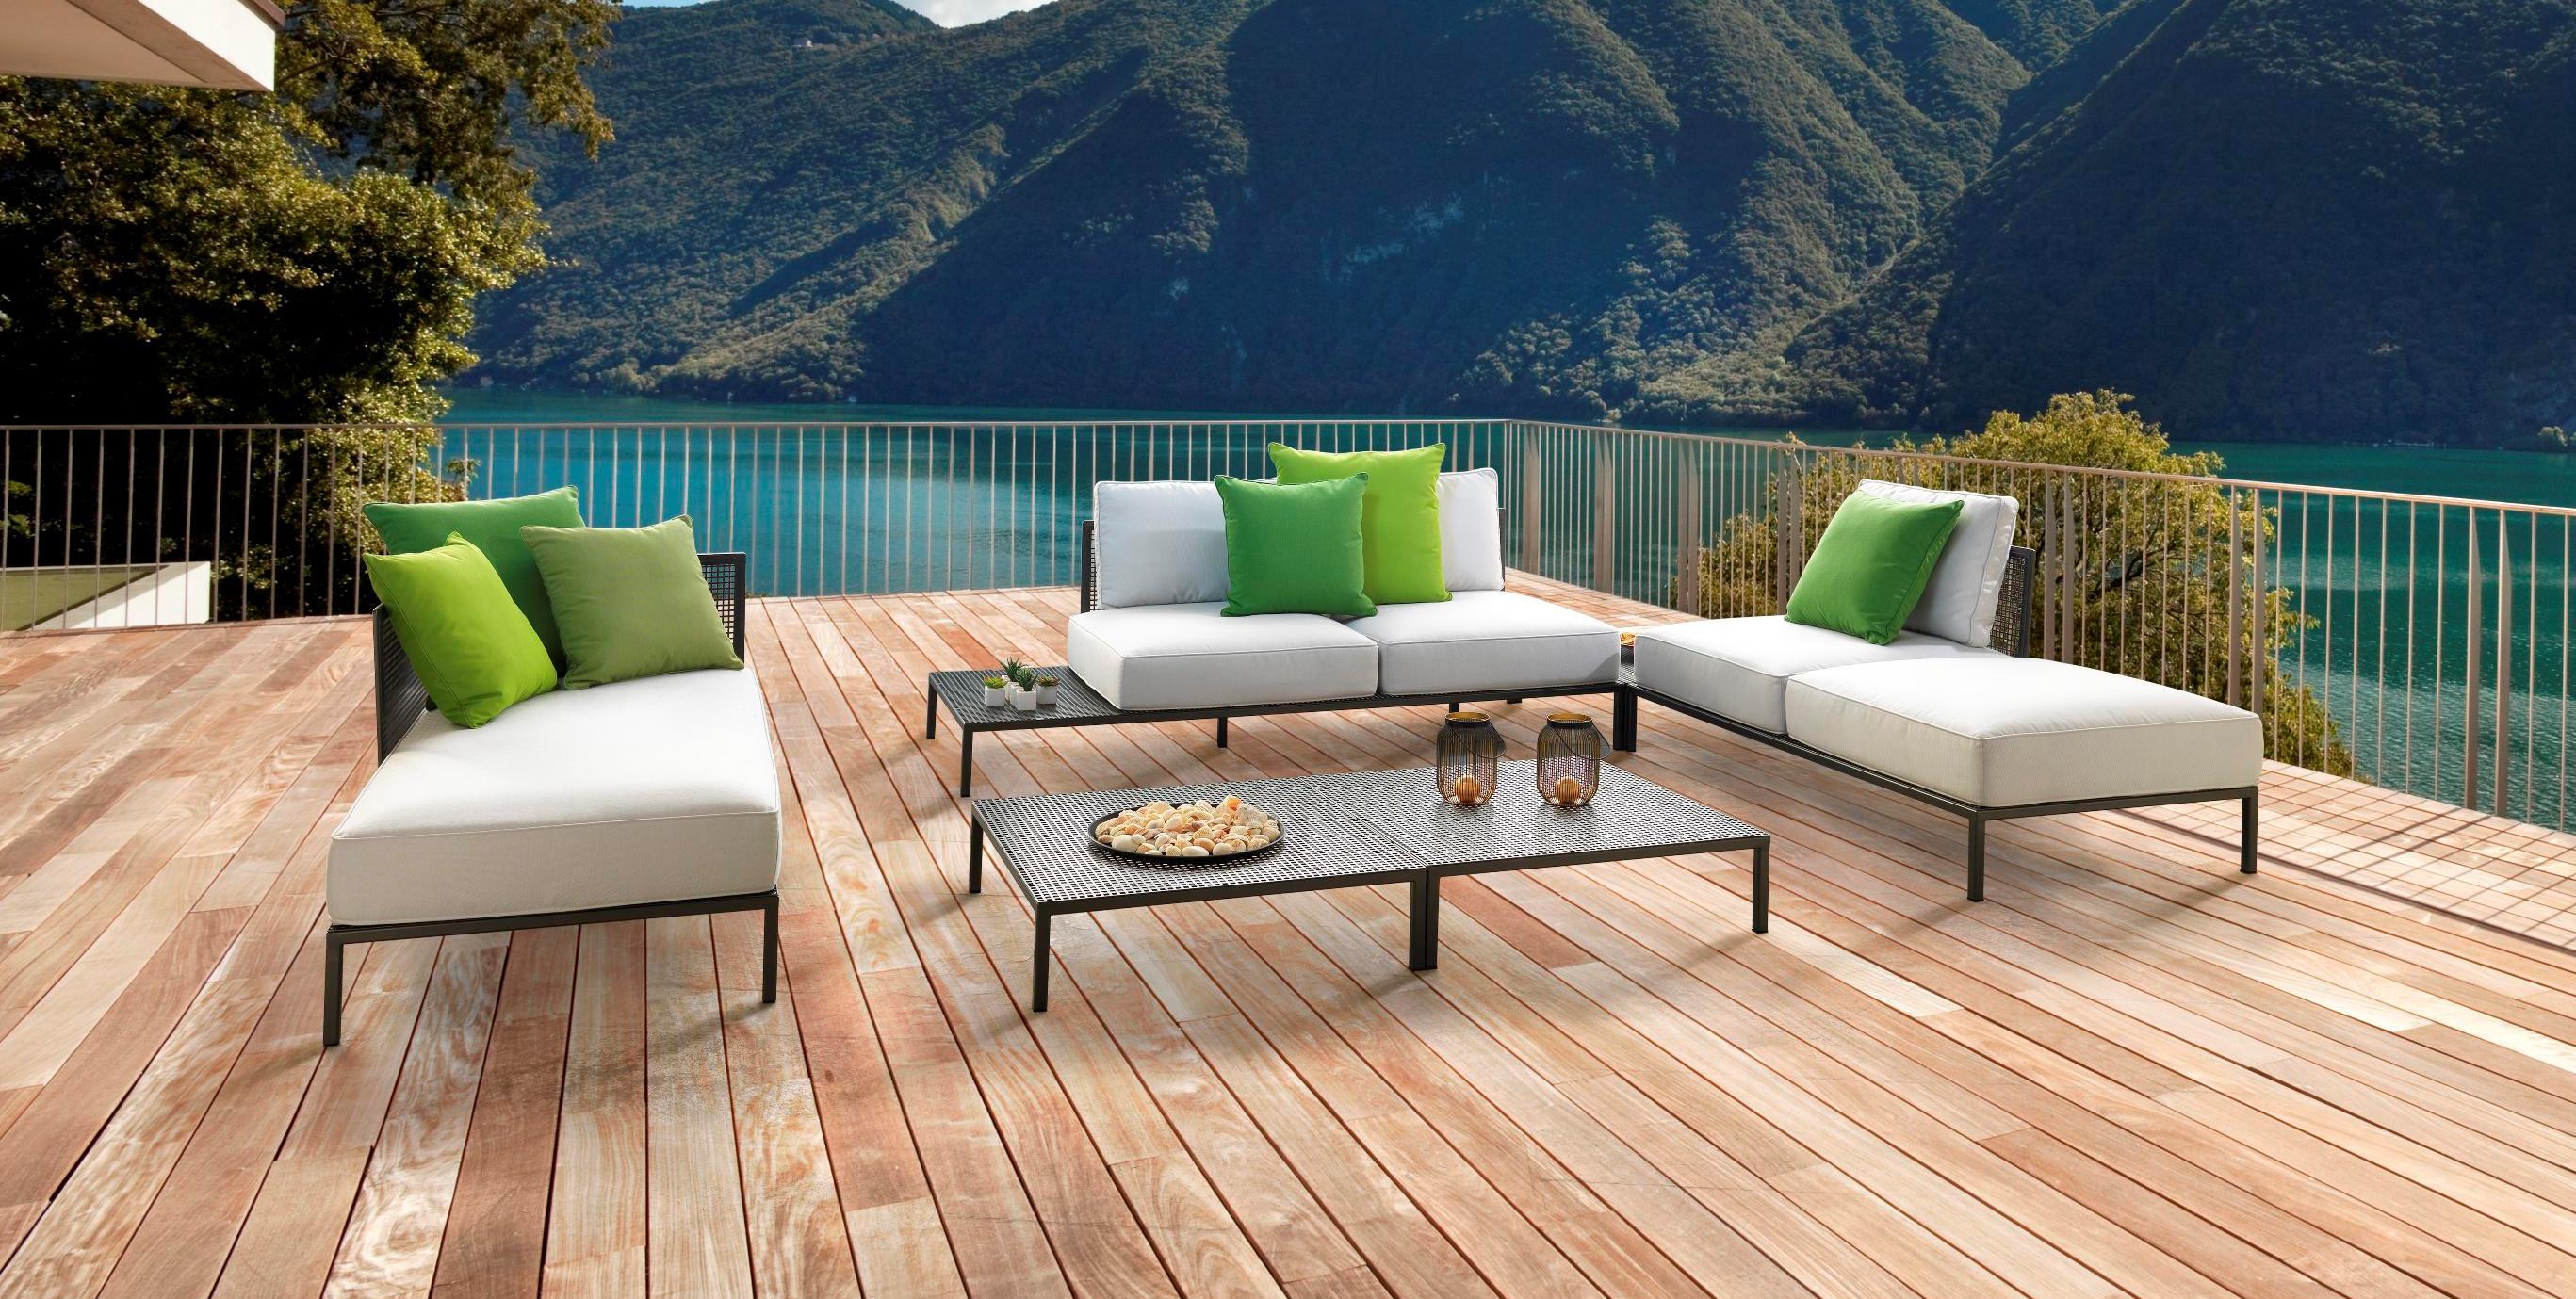 leon outdoor garden furniture for backyard